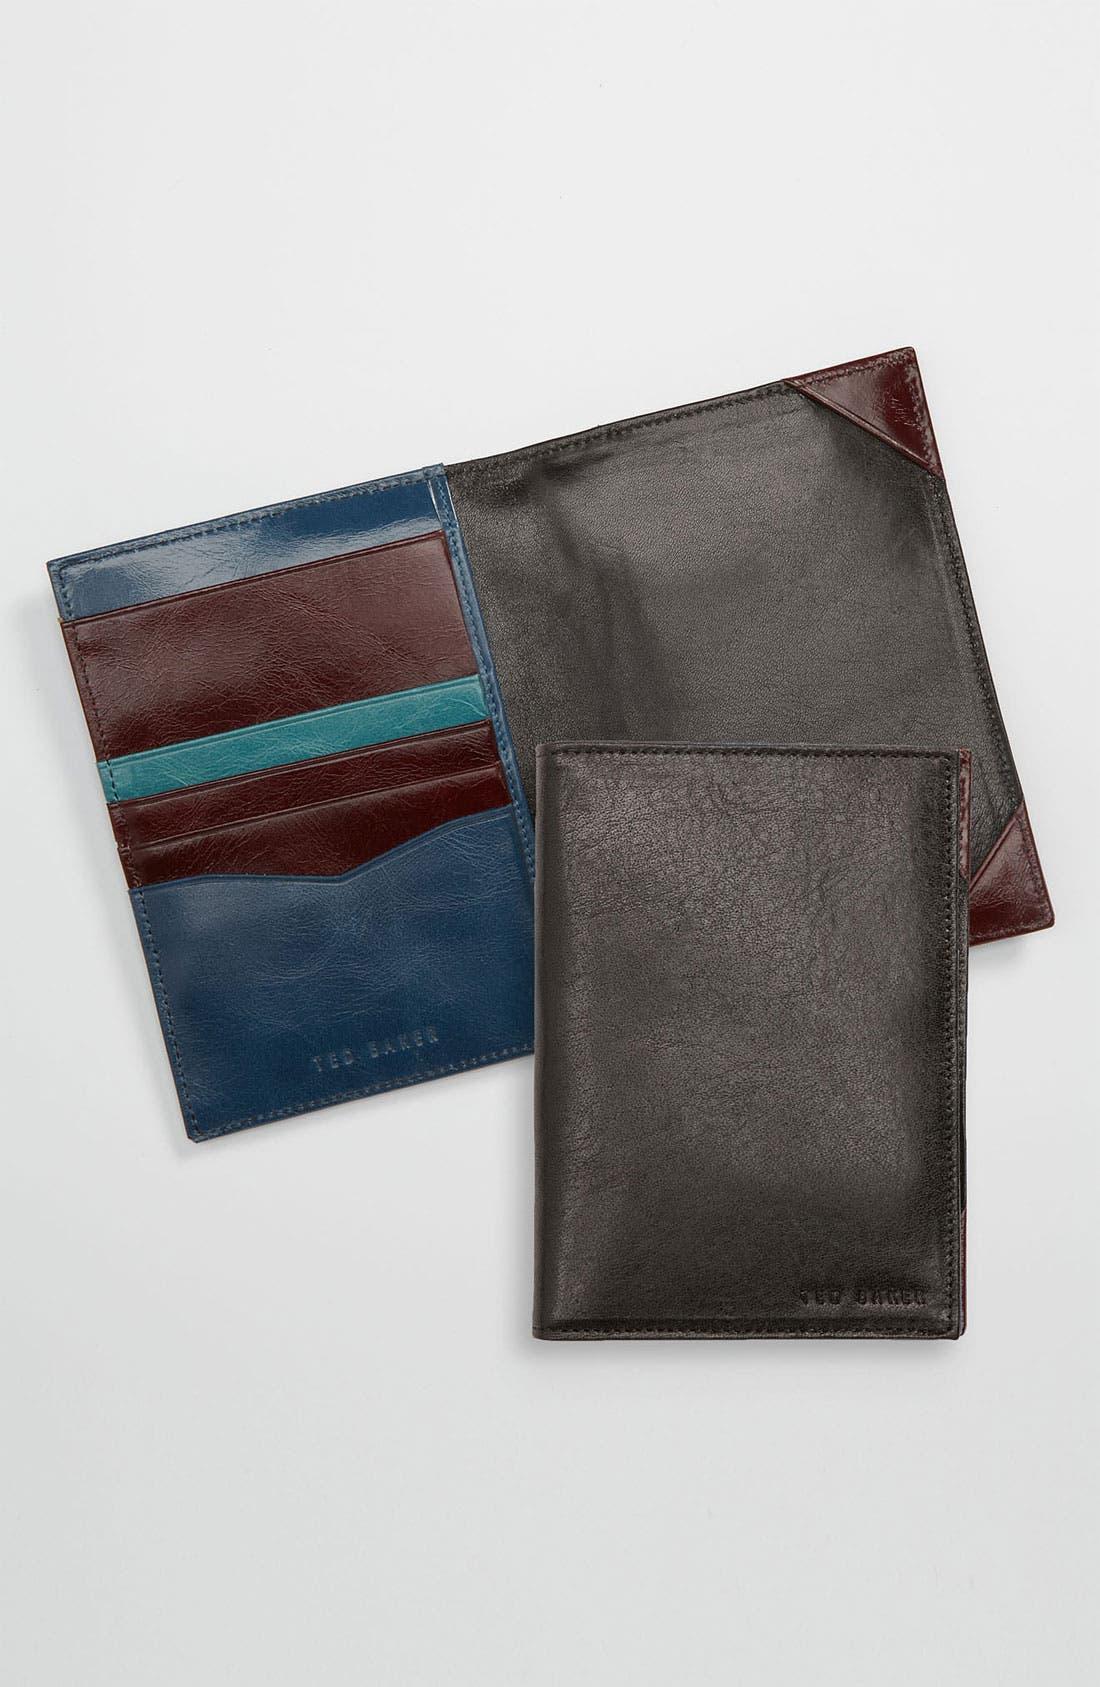 Main Image - Ted Baker London 'Passdoc' Passport Wallet